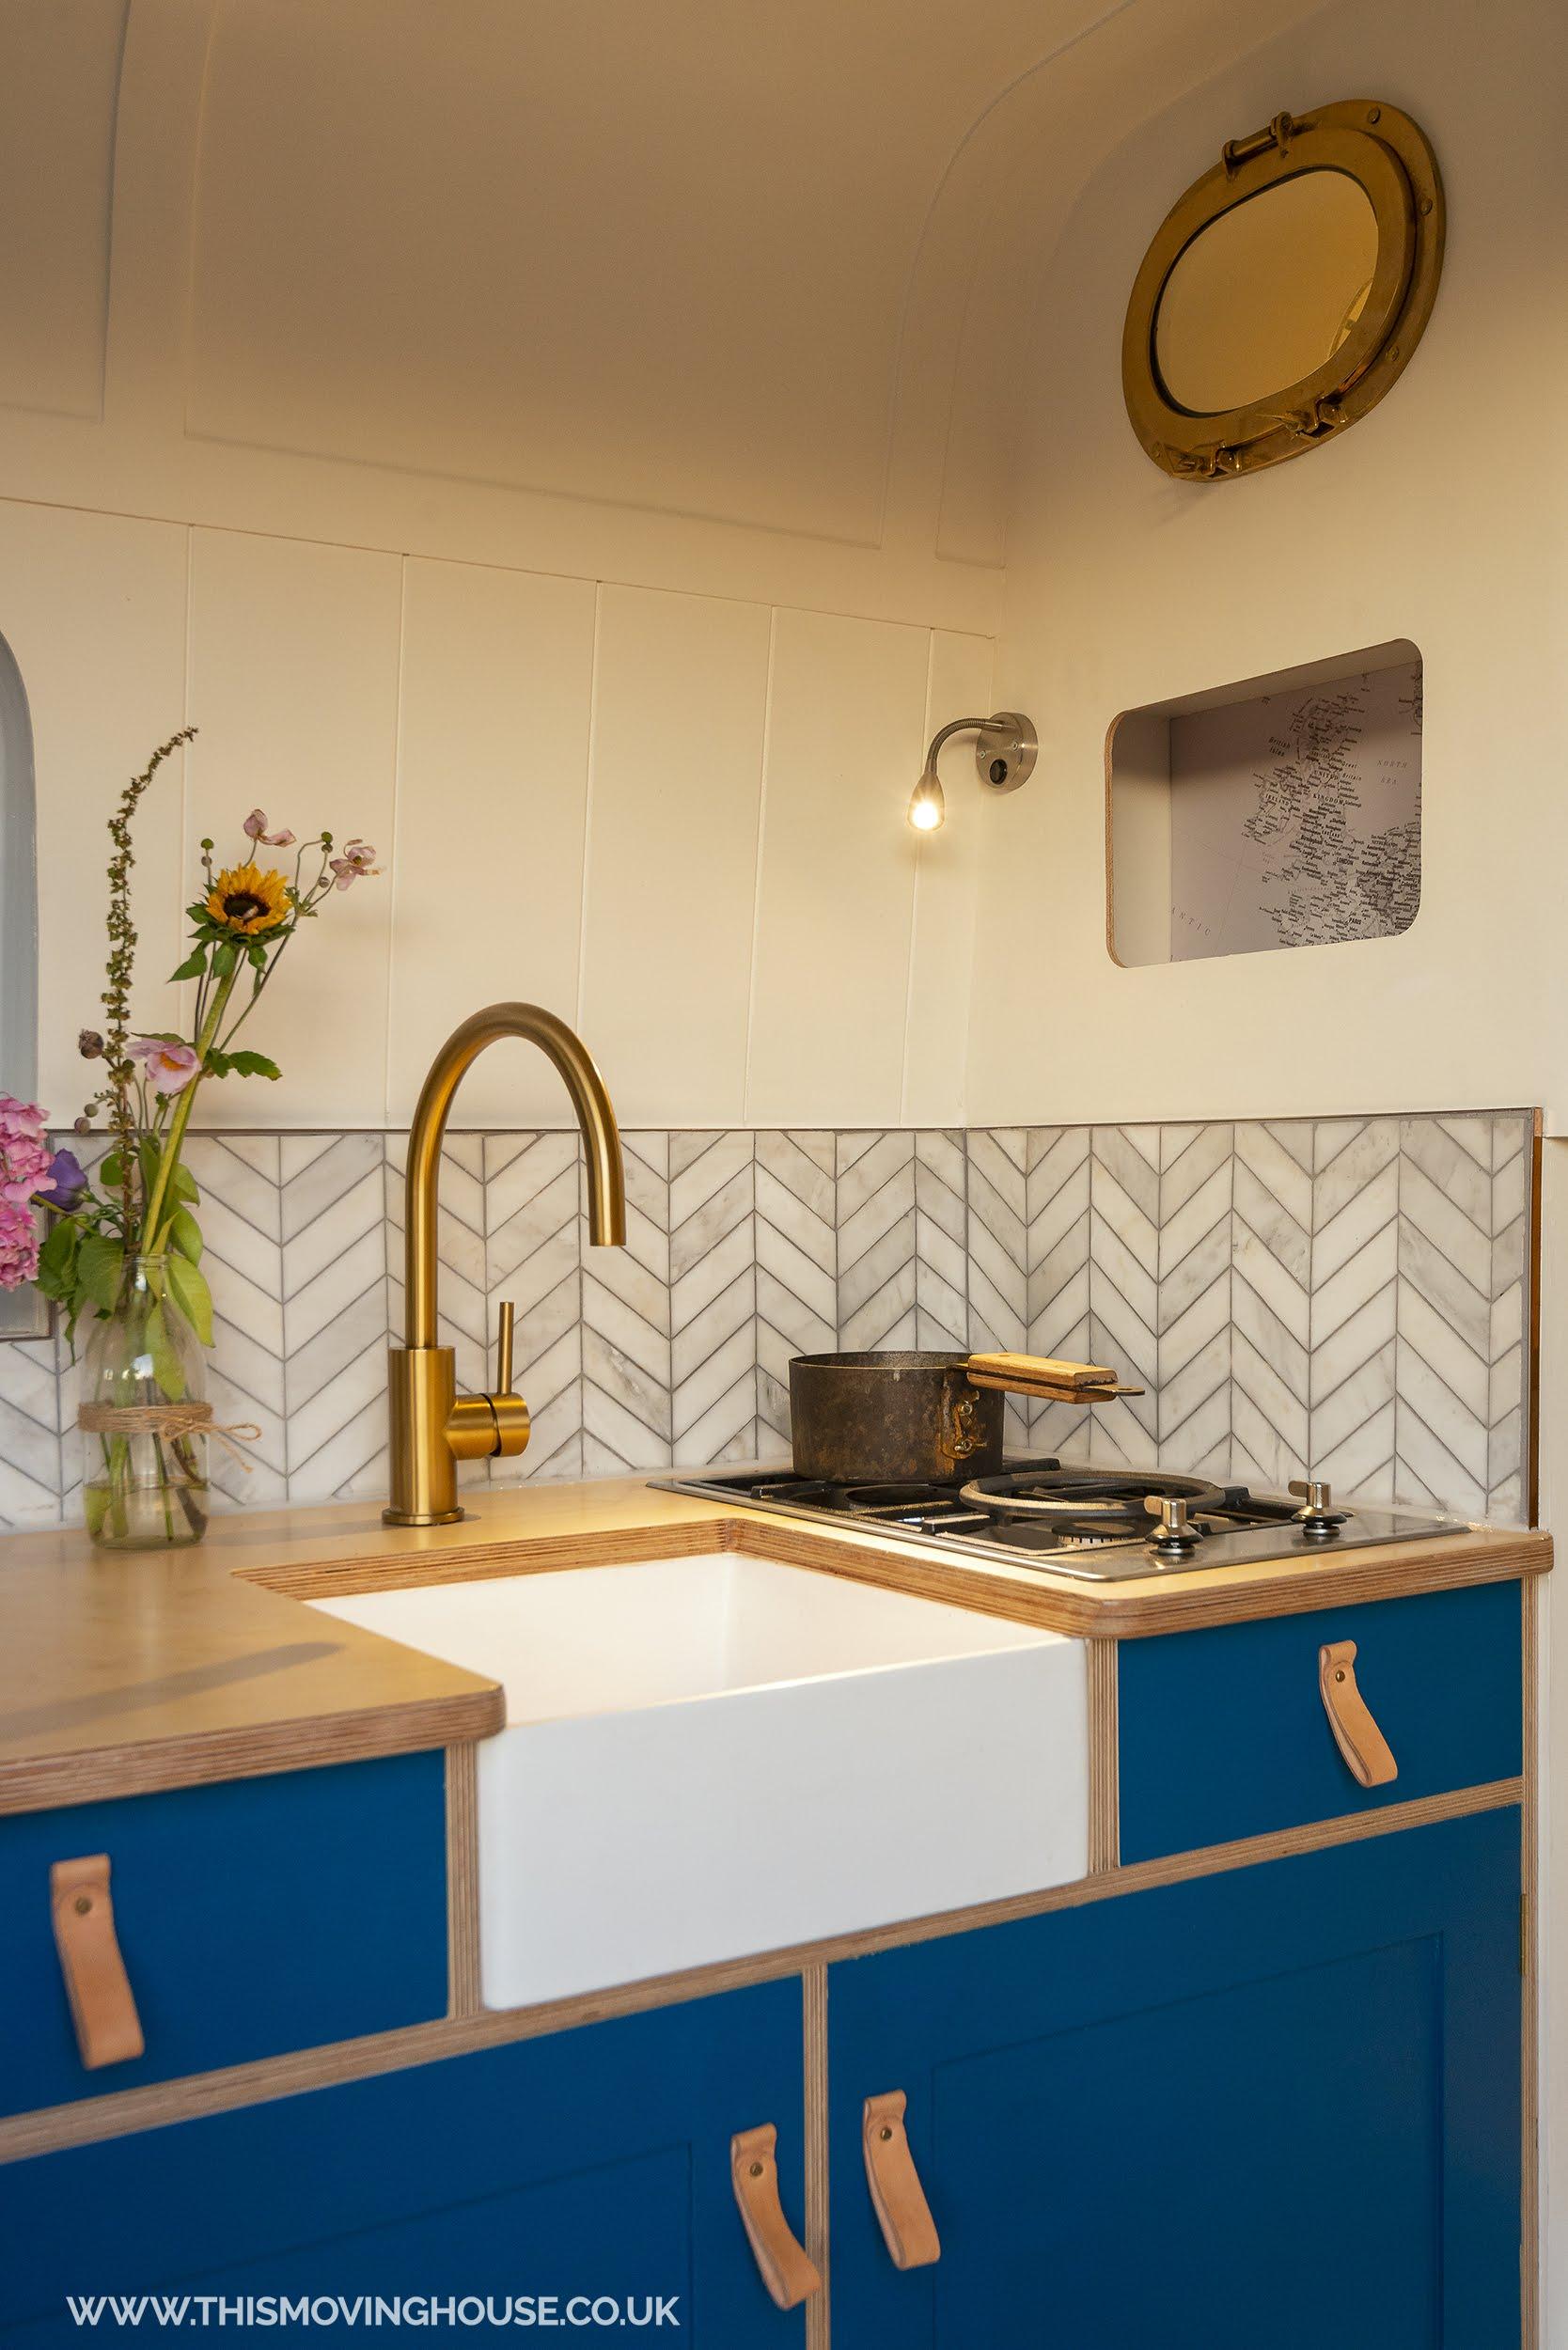 mini belfast sink in a camper van kitchen